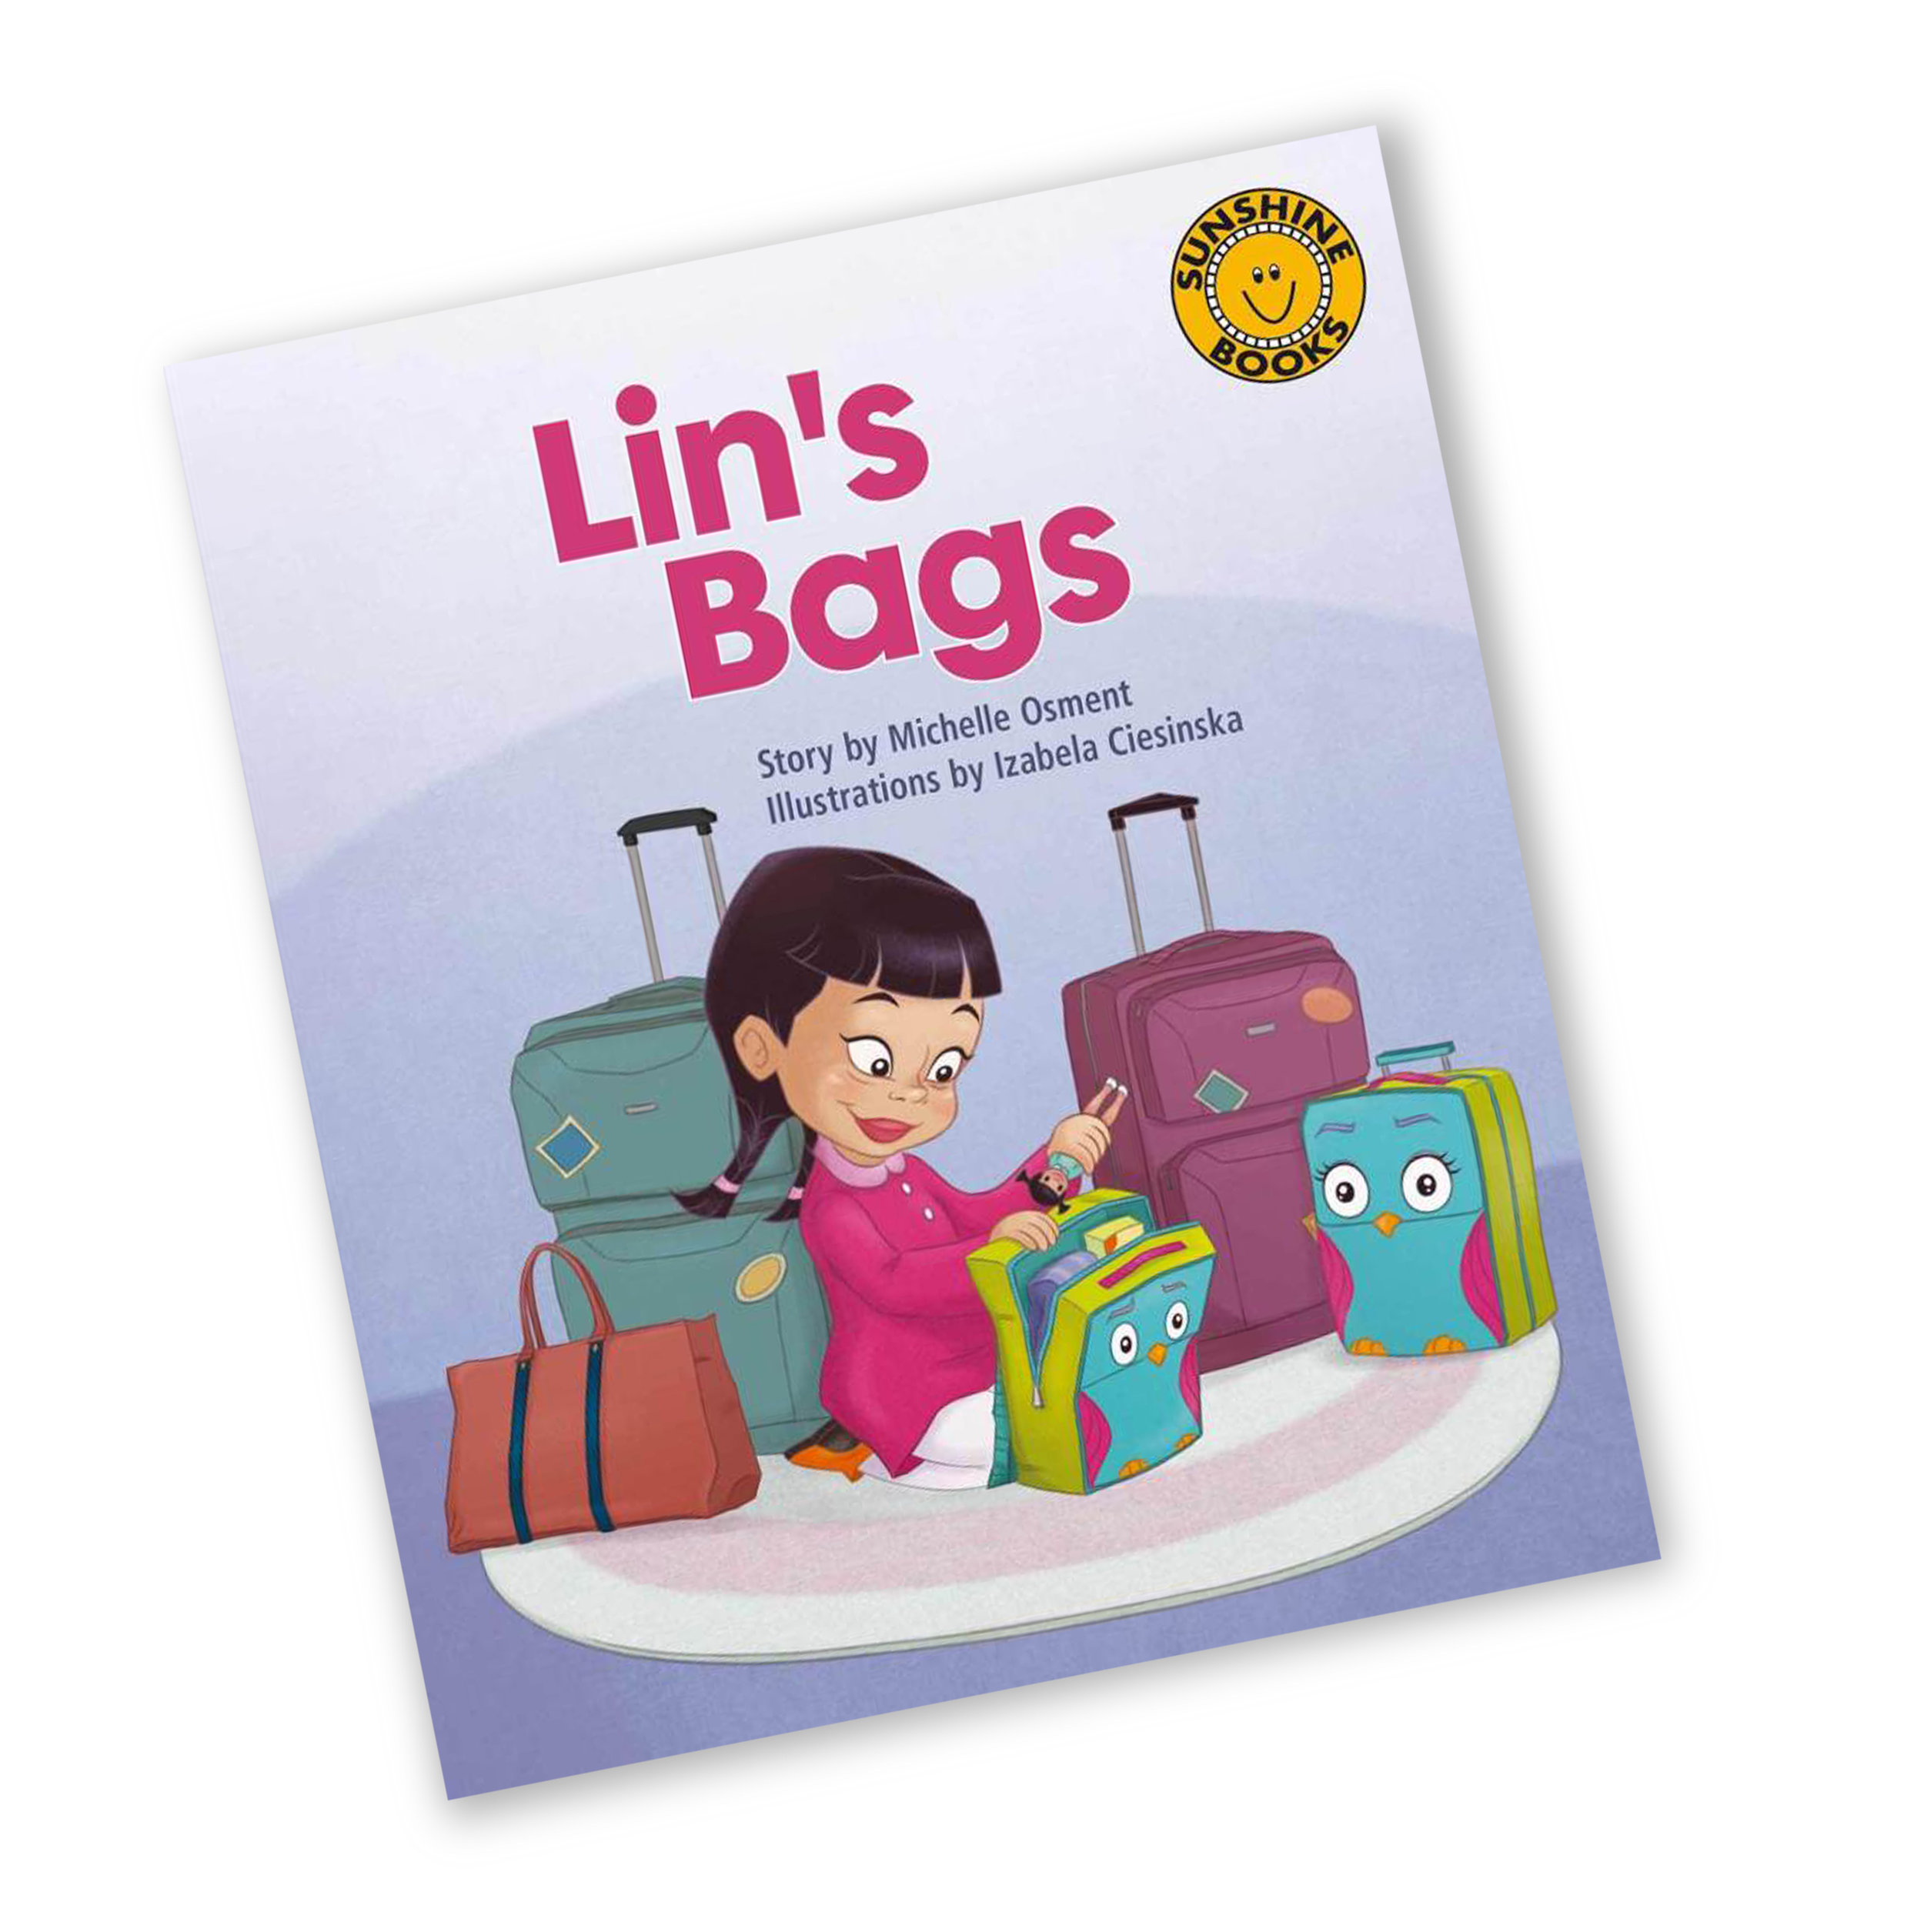 LB_book.jpg